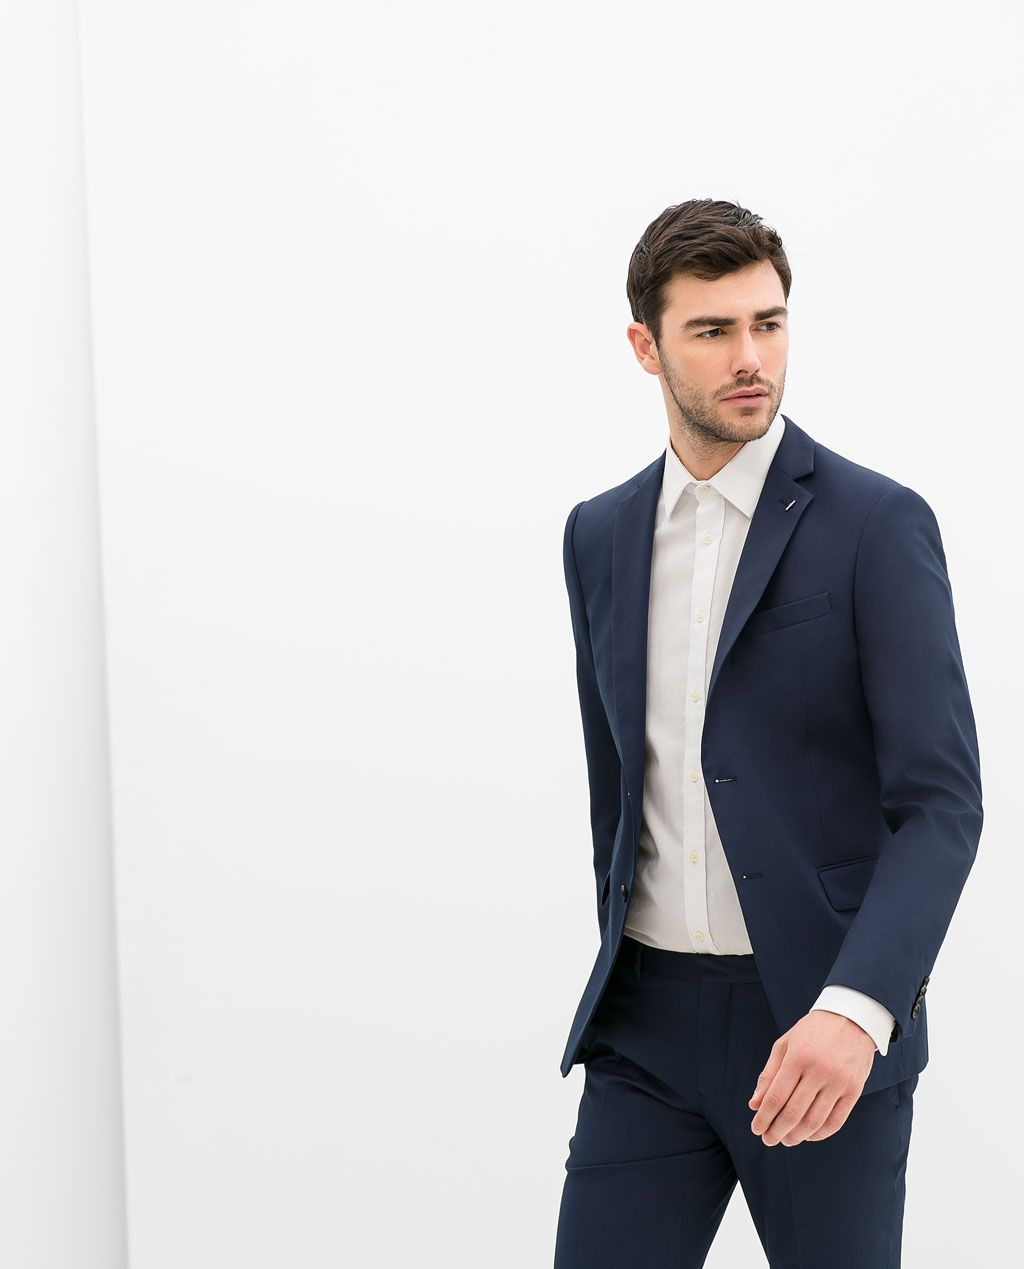 b86e7f0f522e4 ZARA - HOMBRE - TRAJE AZUL TINTA | To wear | Zara hombre traje ...